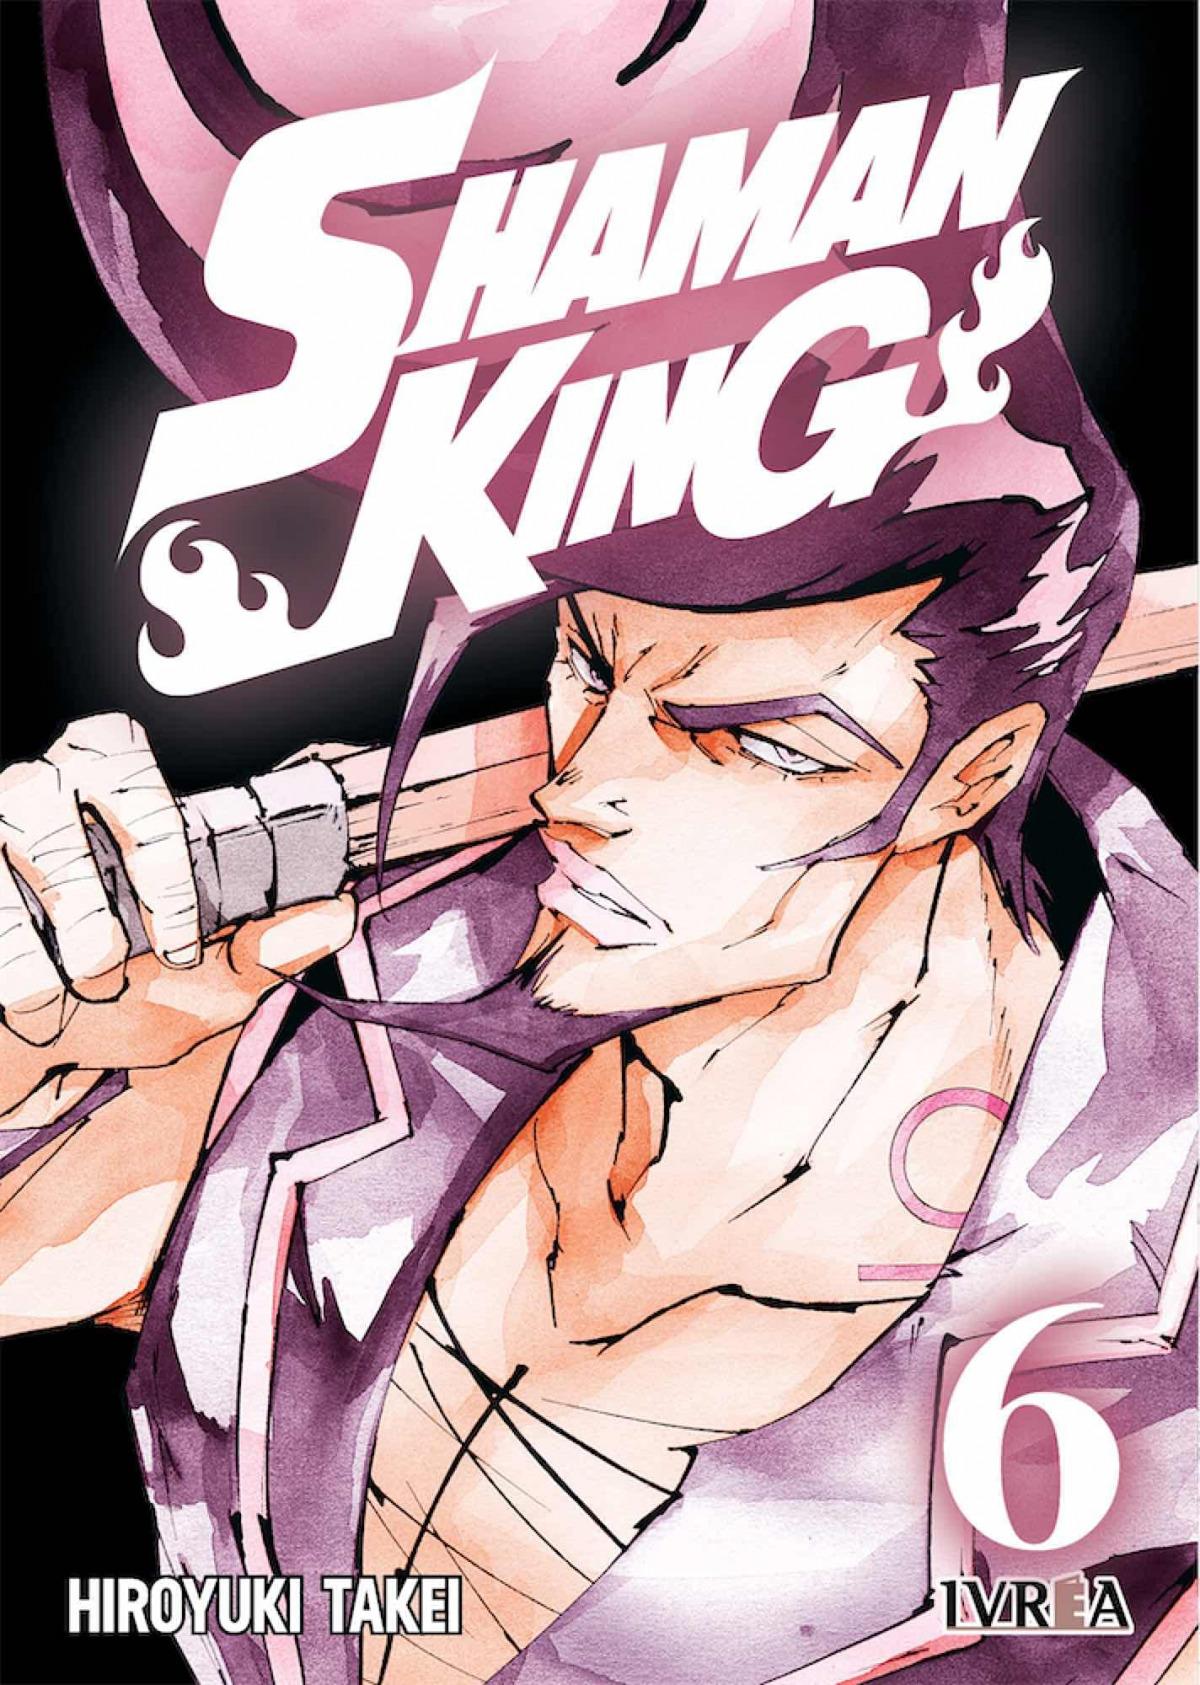 SHAMAN KING 06